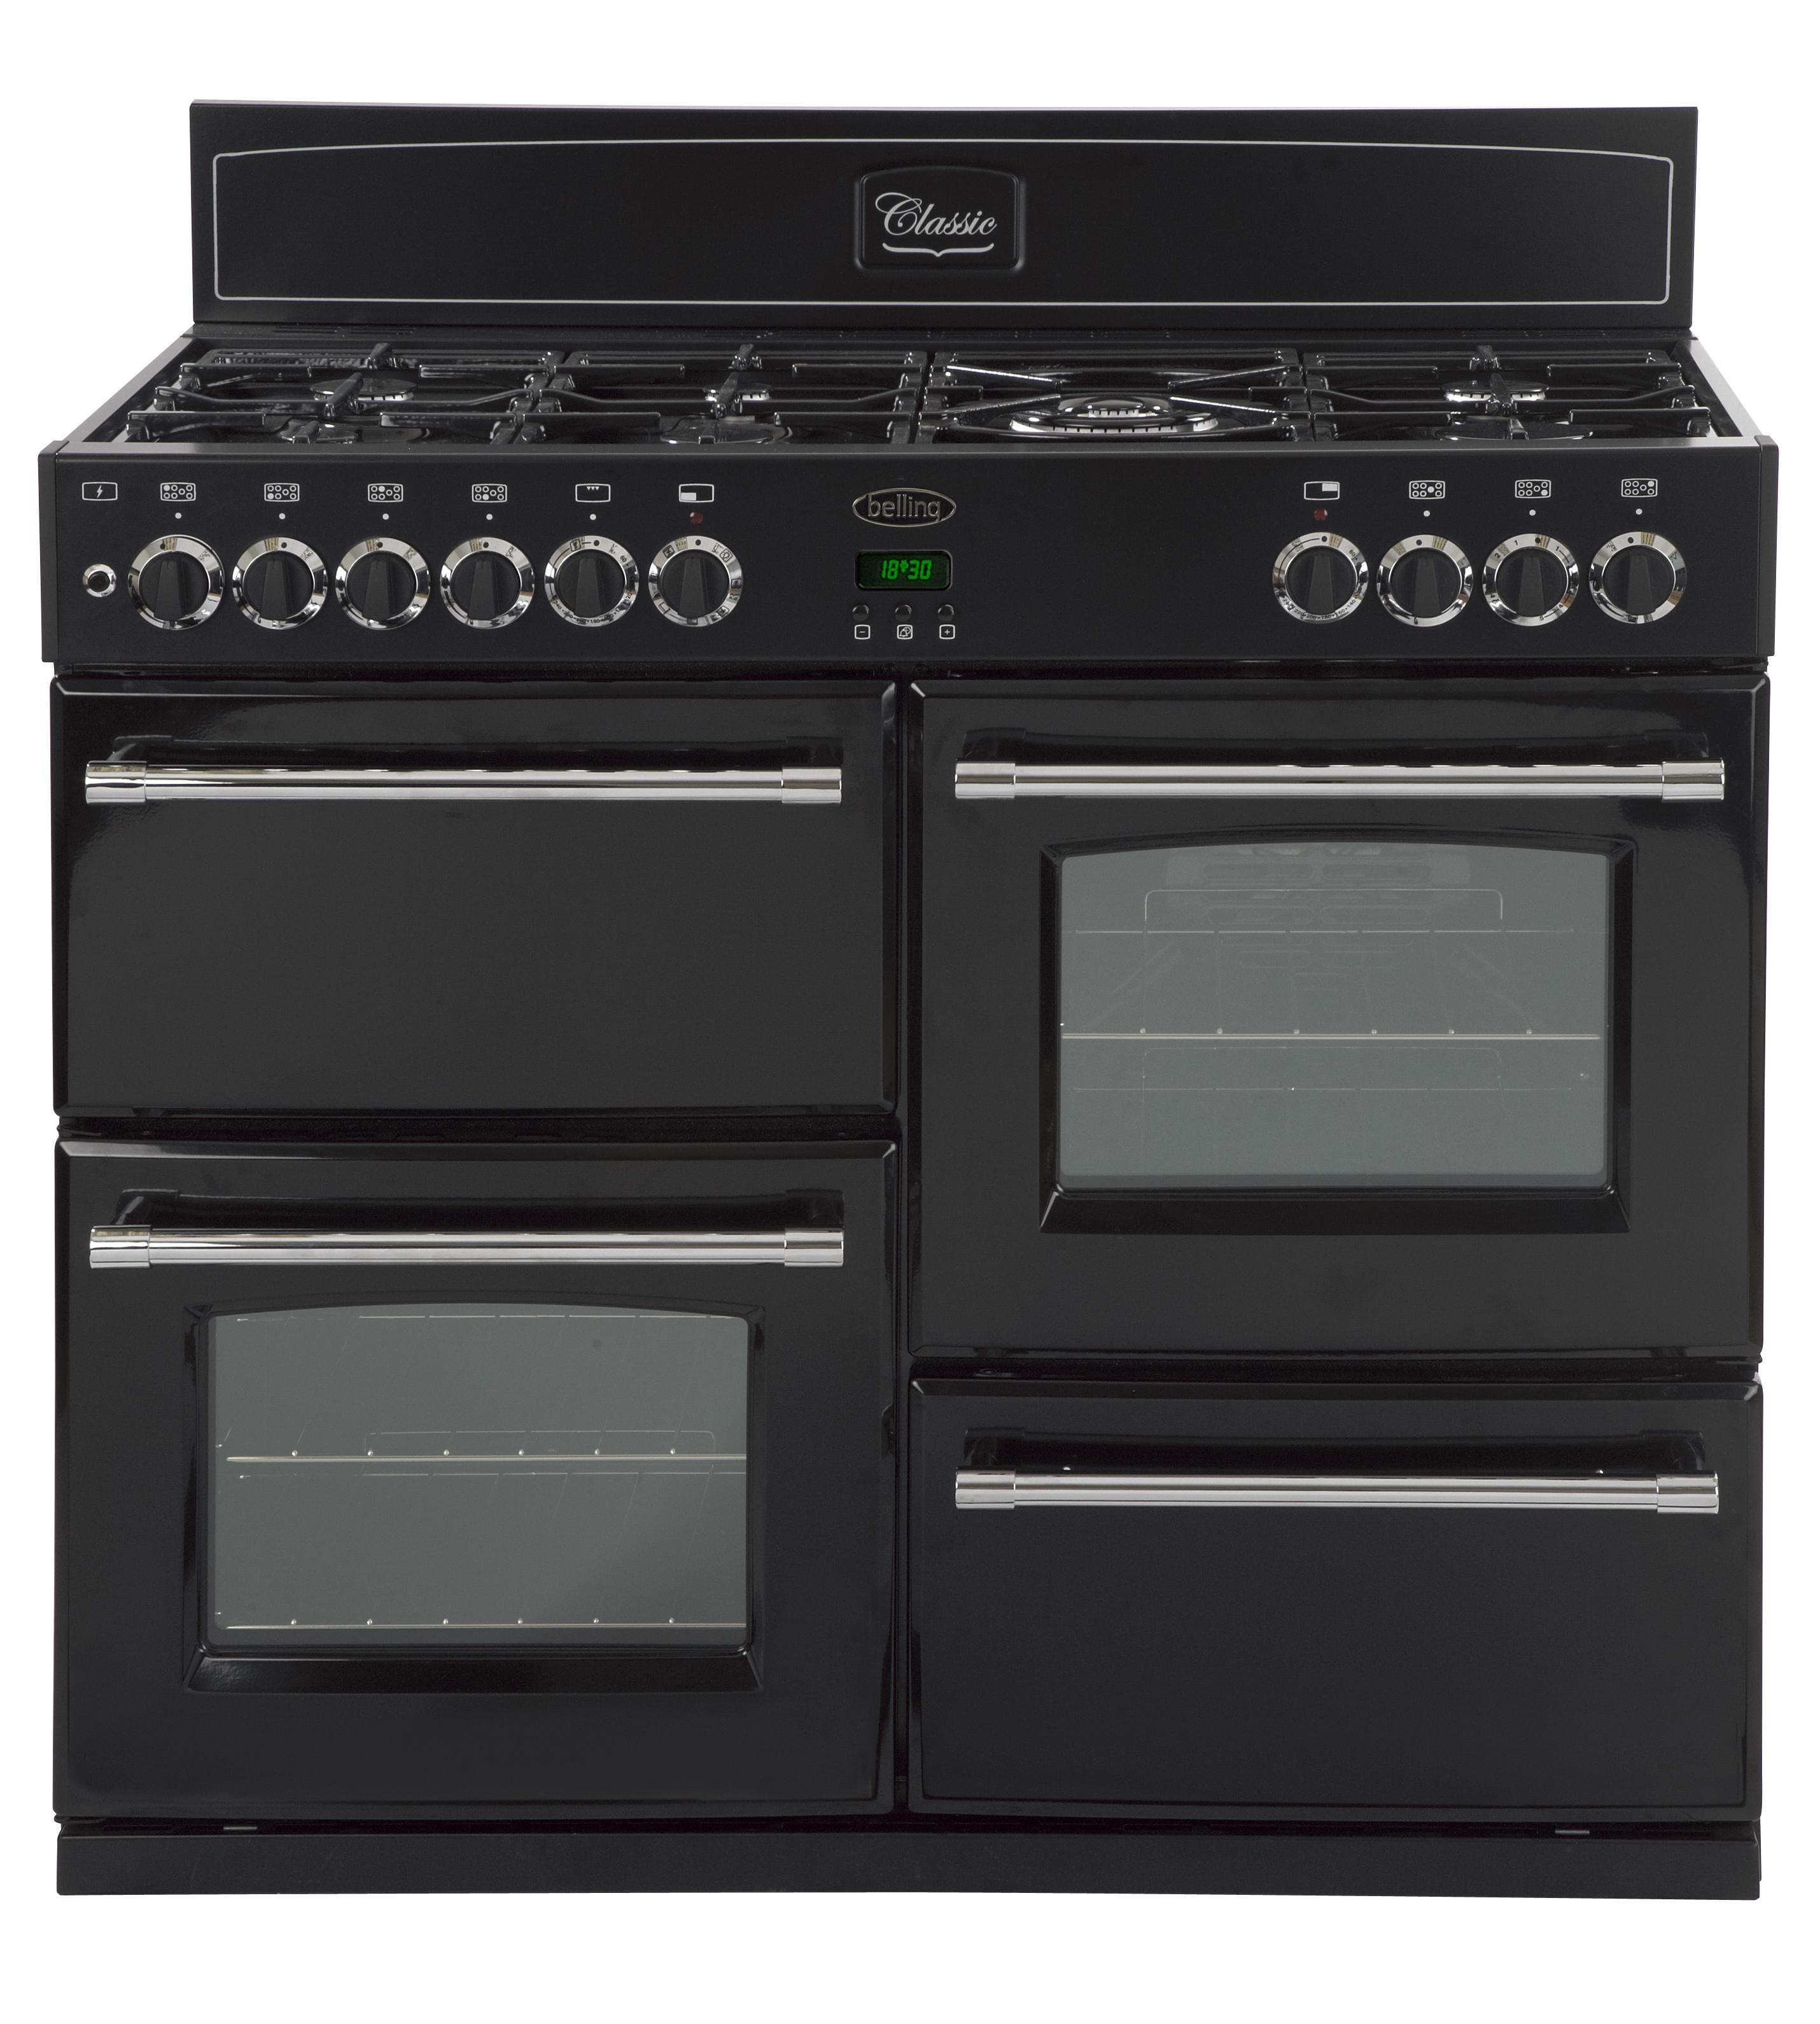 Uncategorized Belling Kitchen Appliances belling fse60doi electric cooker by appliance world classic 100gt range cooker